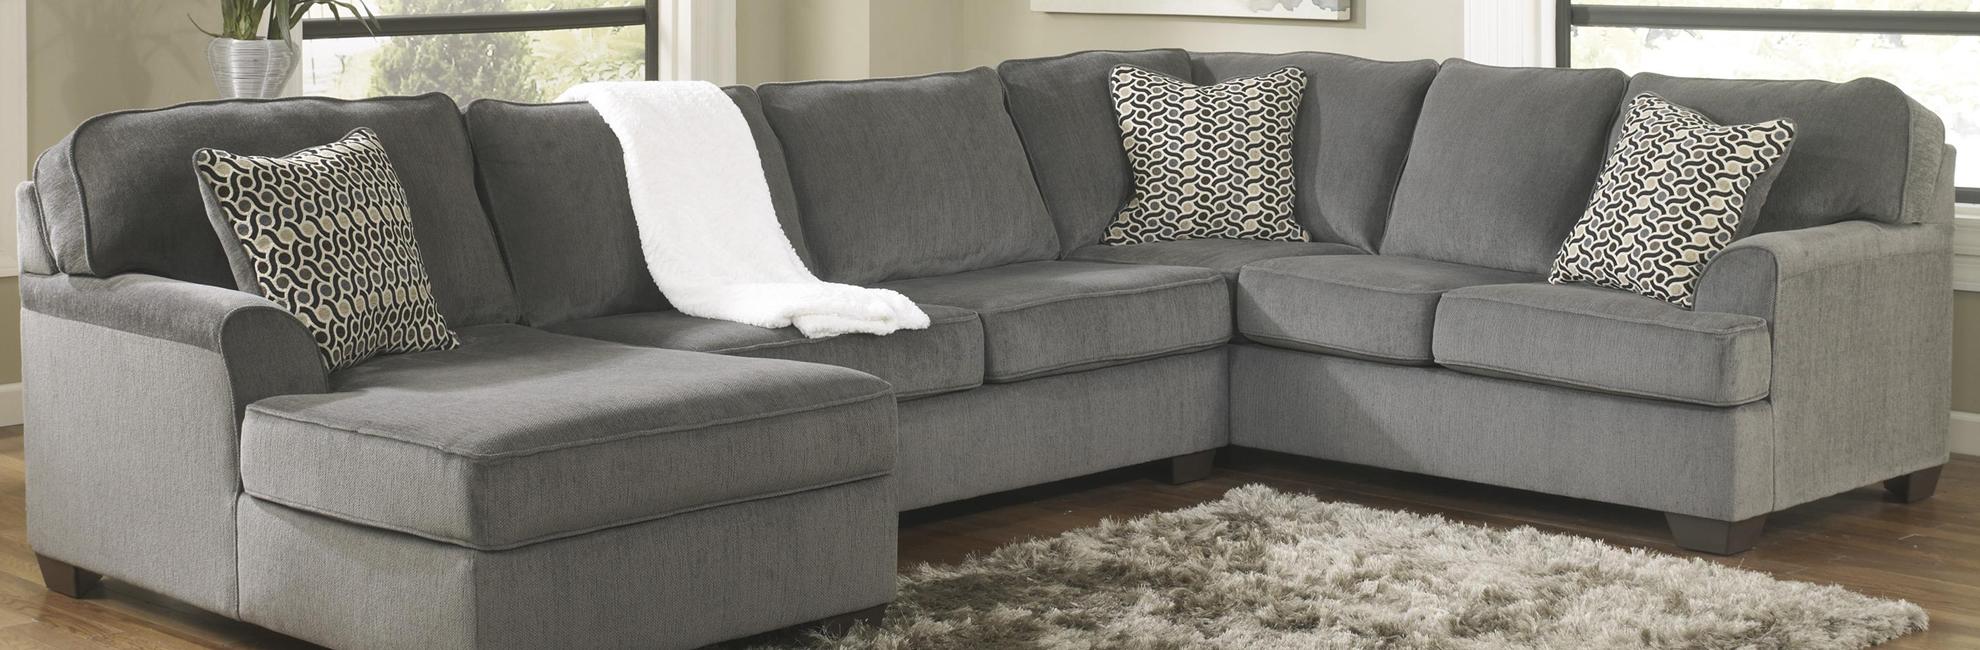 Discount Furniture Lexington Ky